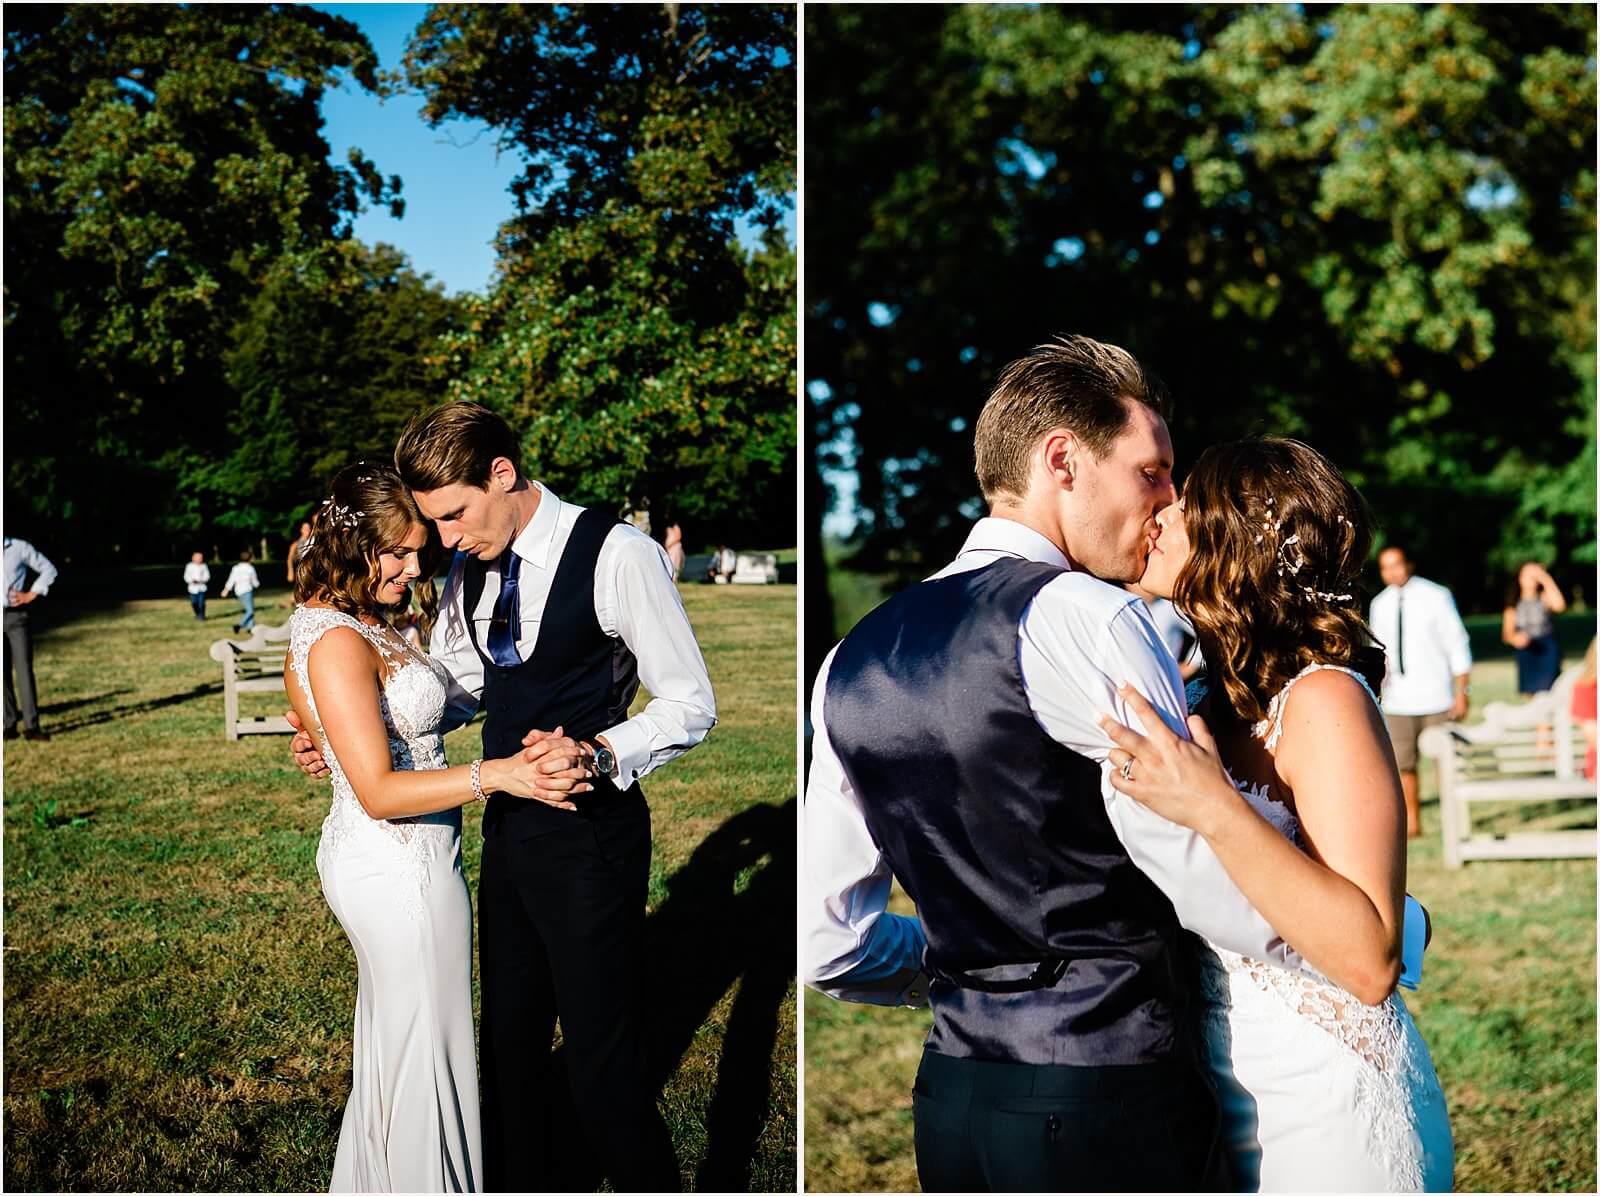 Chateau de Courtomer Wedding | Chantel & Evan 55